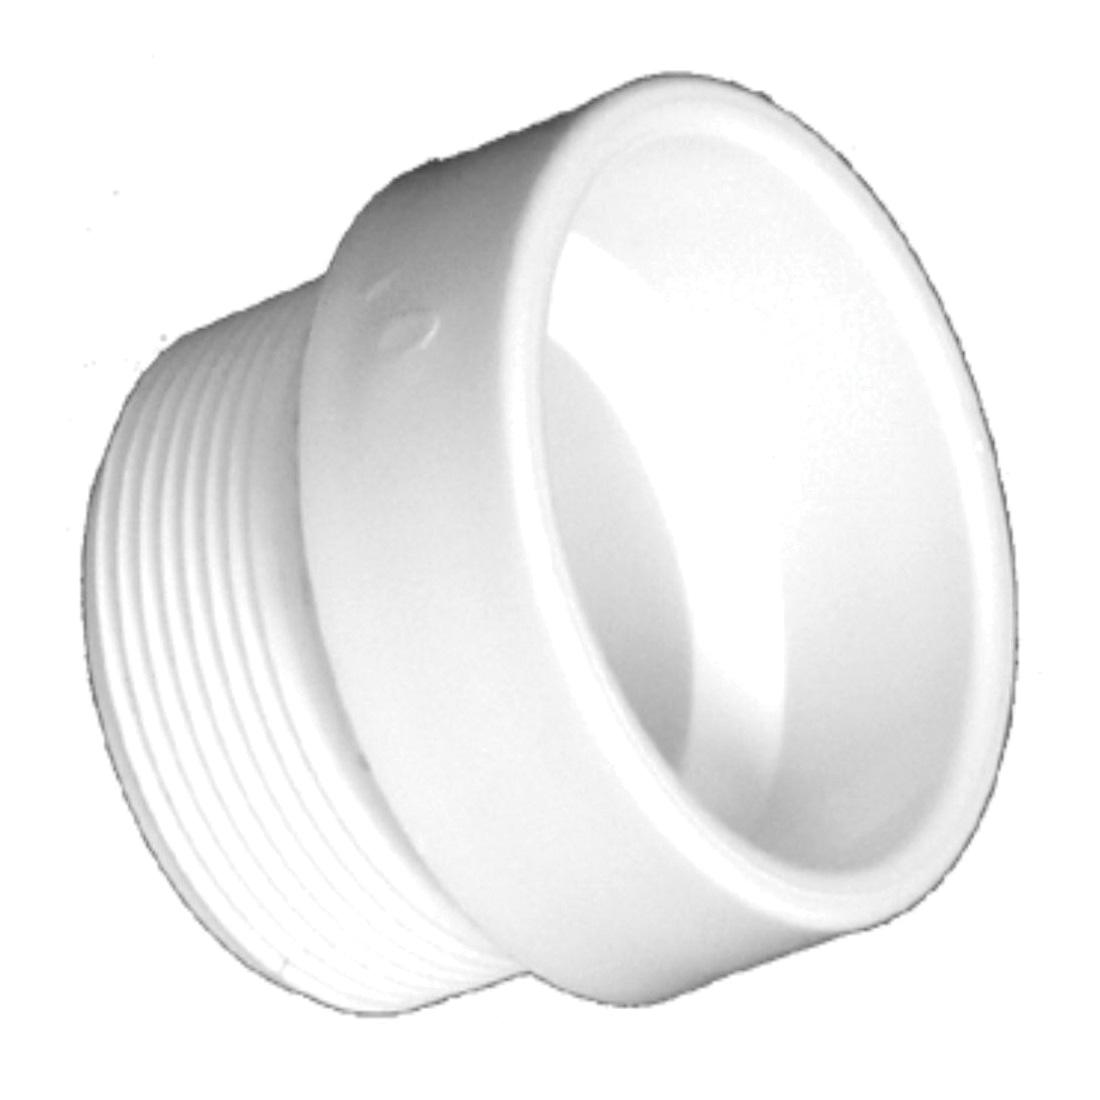 Charlotte PVC 00104 0800 DWV Female Trap Adapter, 1-1/2 in, Hub x Slip, SCH 40/STD, PVC, Domestic